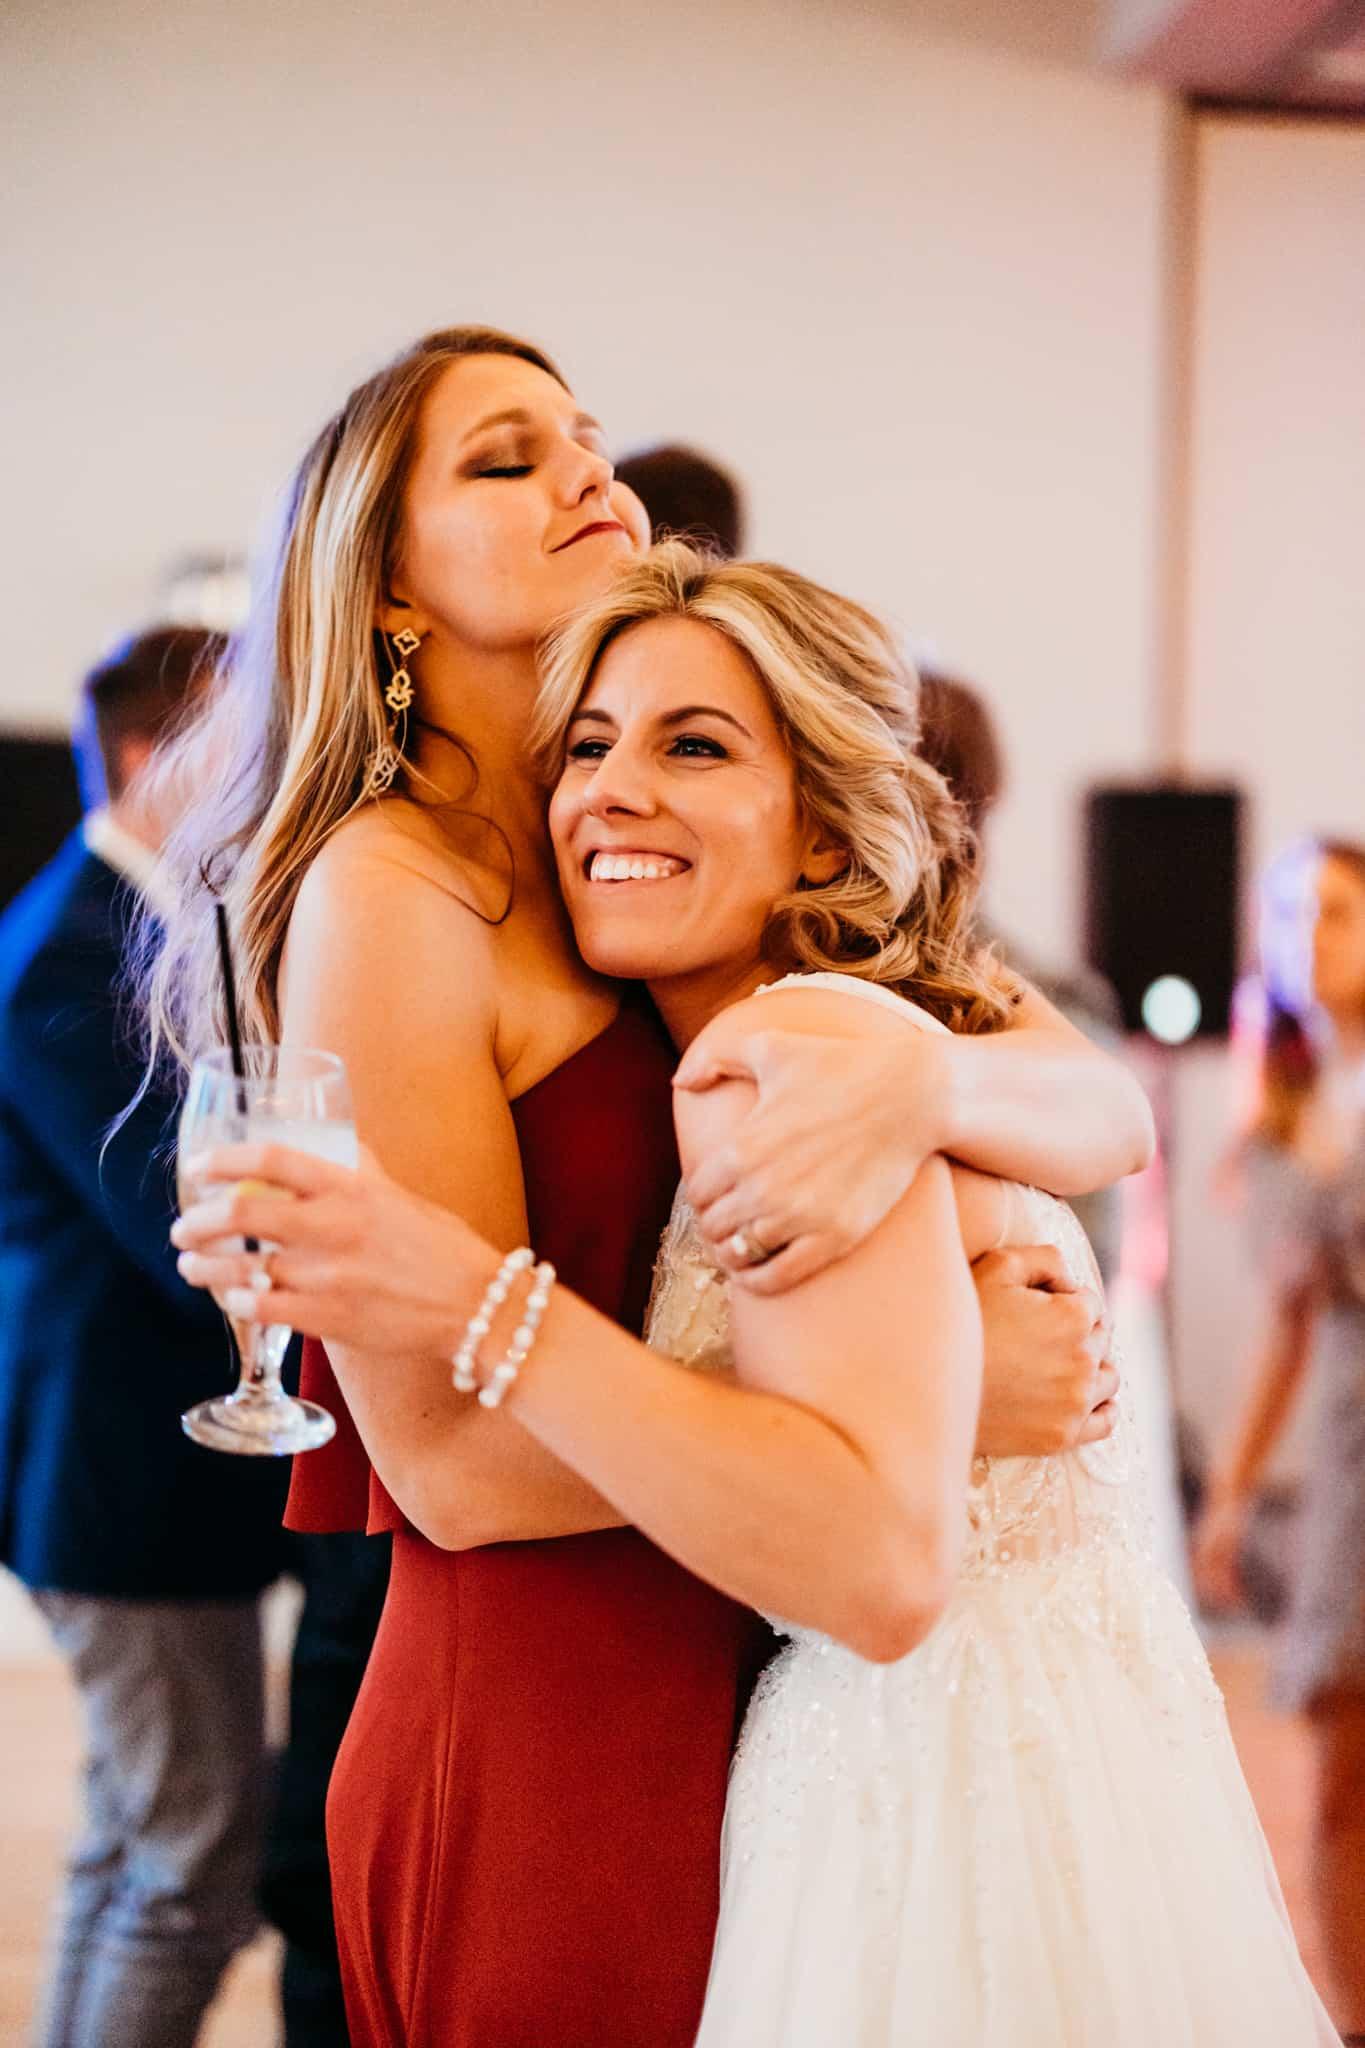 bride dances with a female guest at her hazeltine national golf club wedding